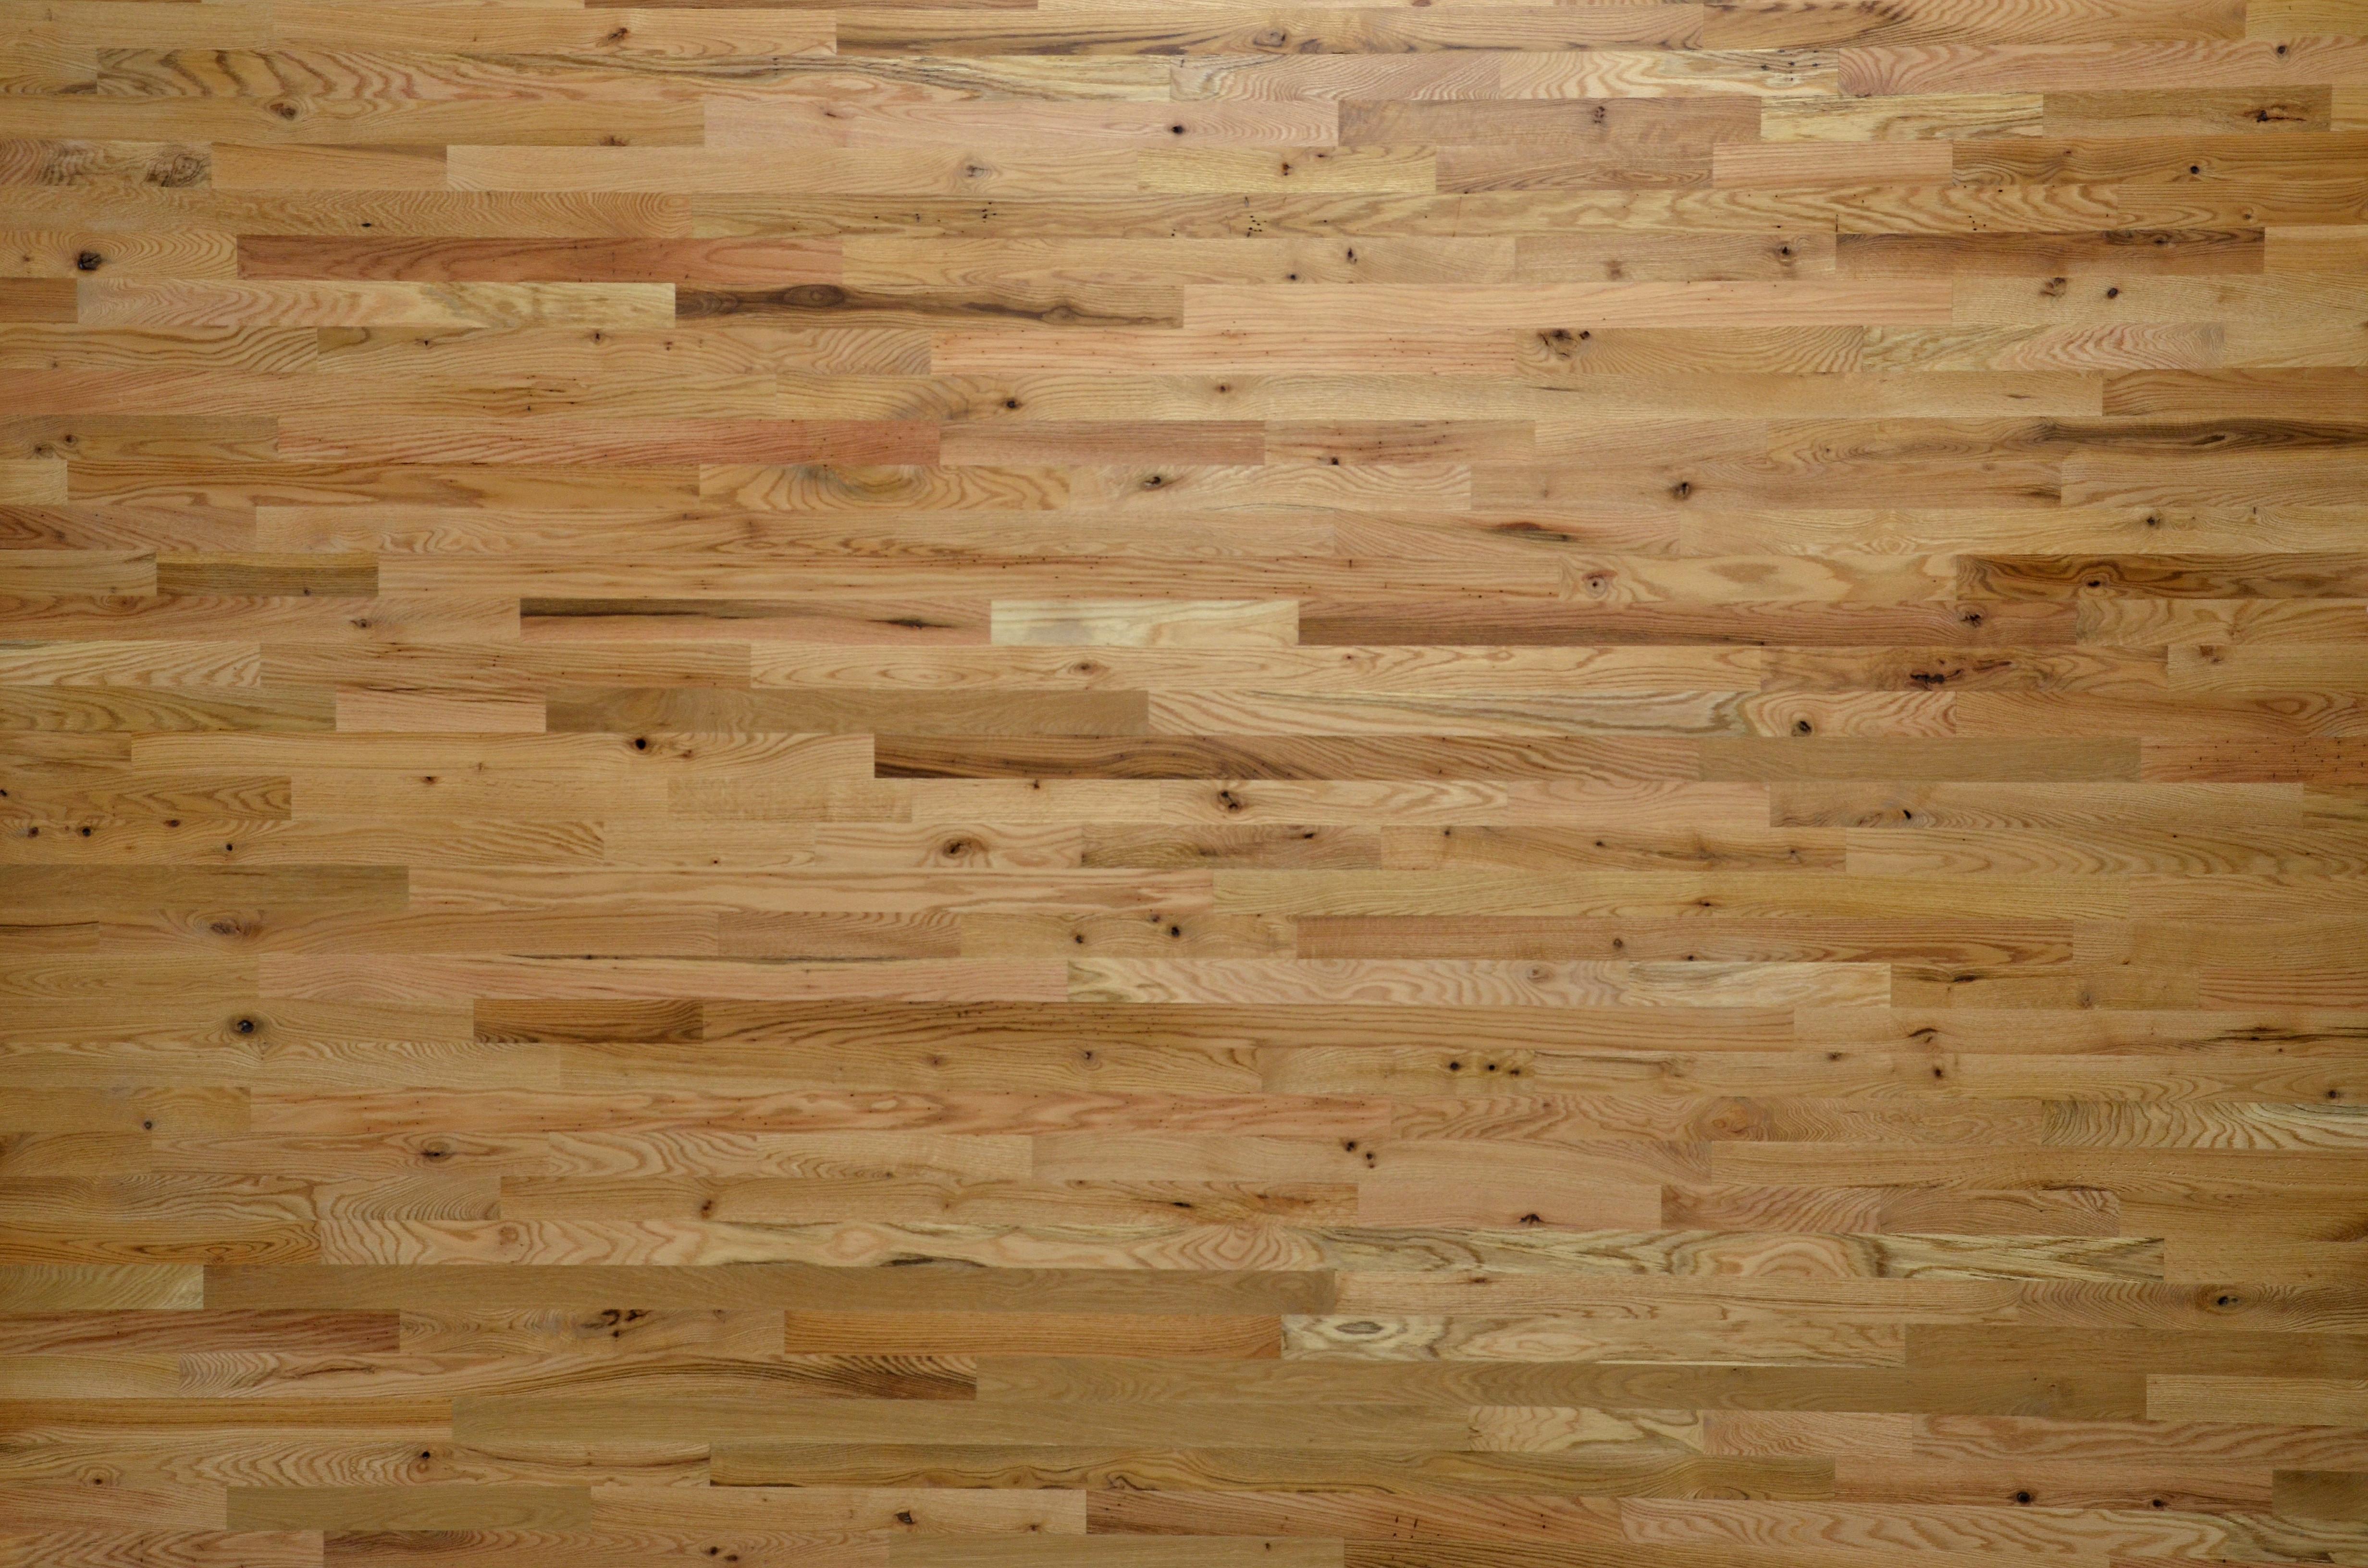 how to start a hardwood flooring business of lacrosse hardwood flooring walnut white oak red oak hickory intended for 2 common red oak